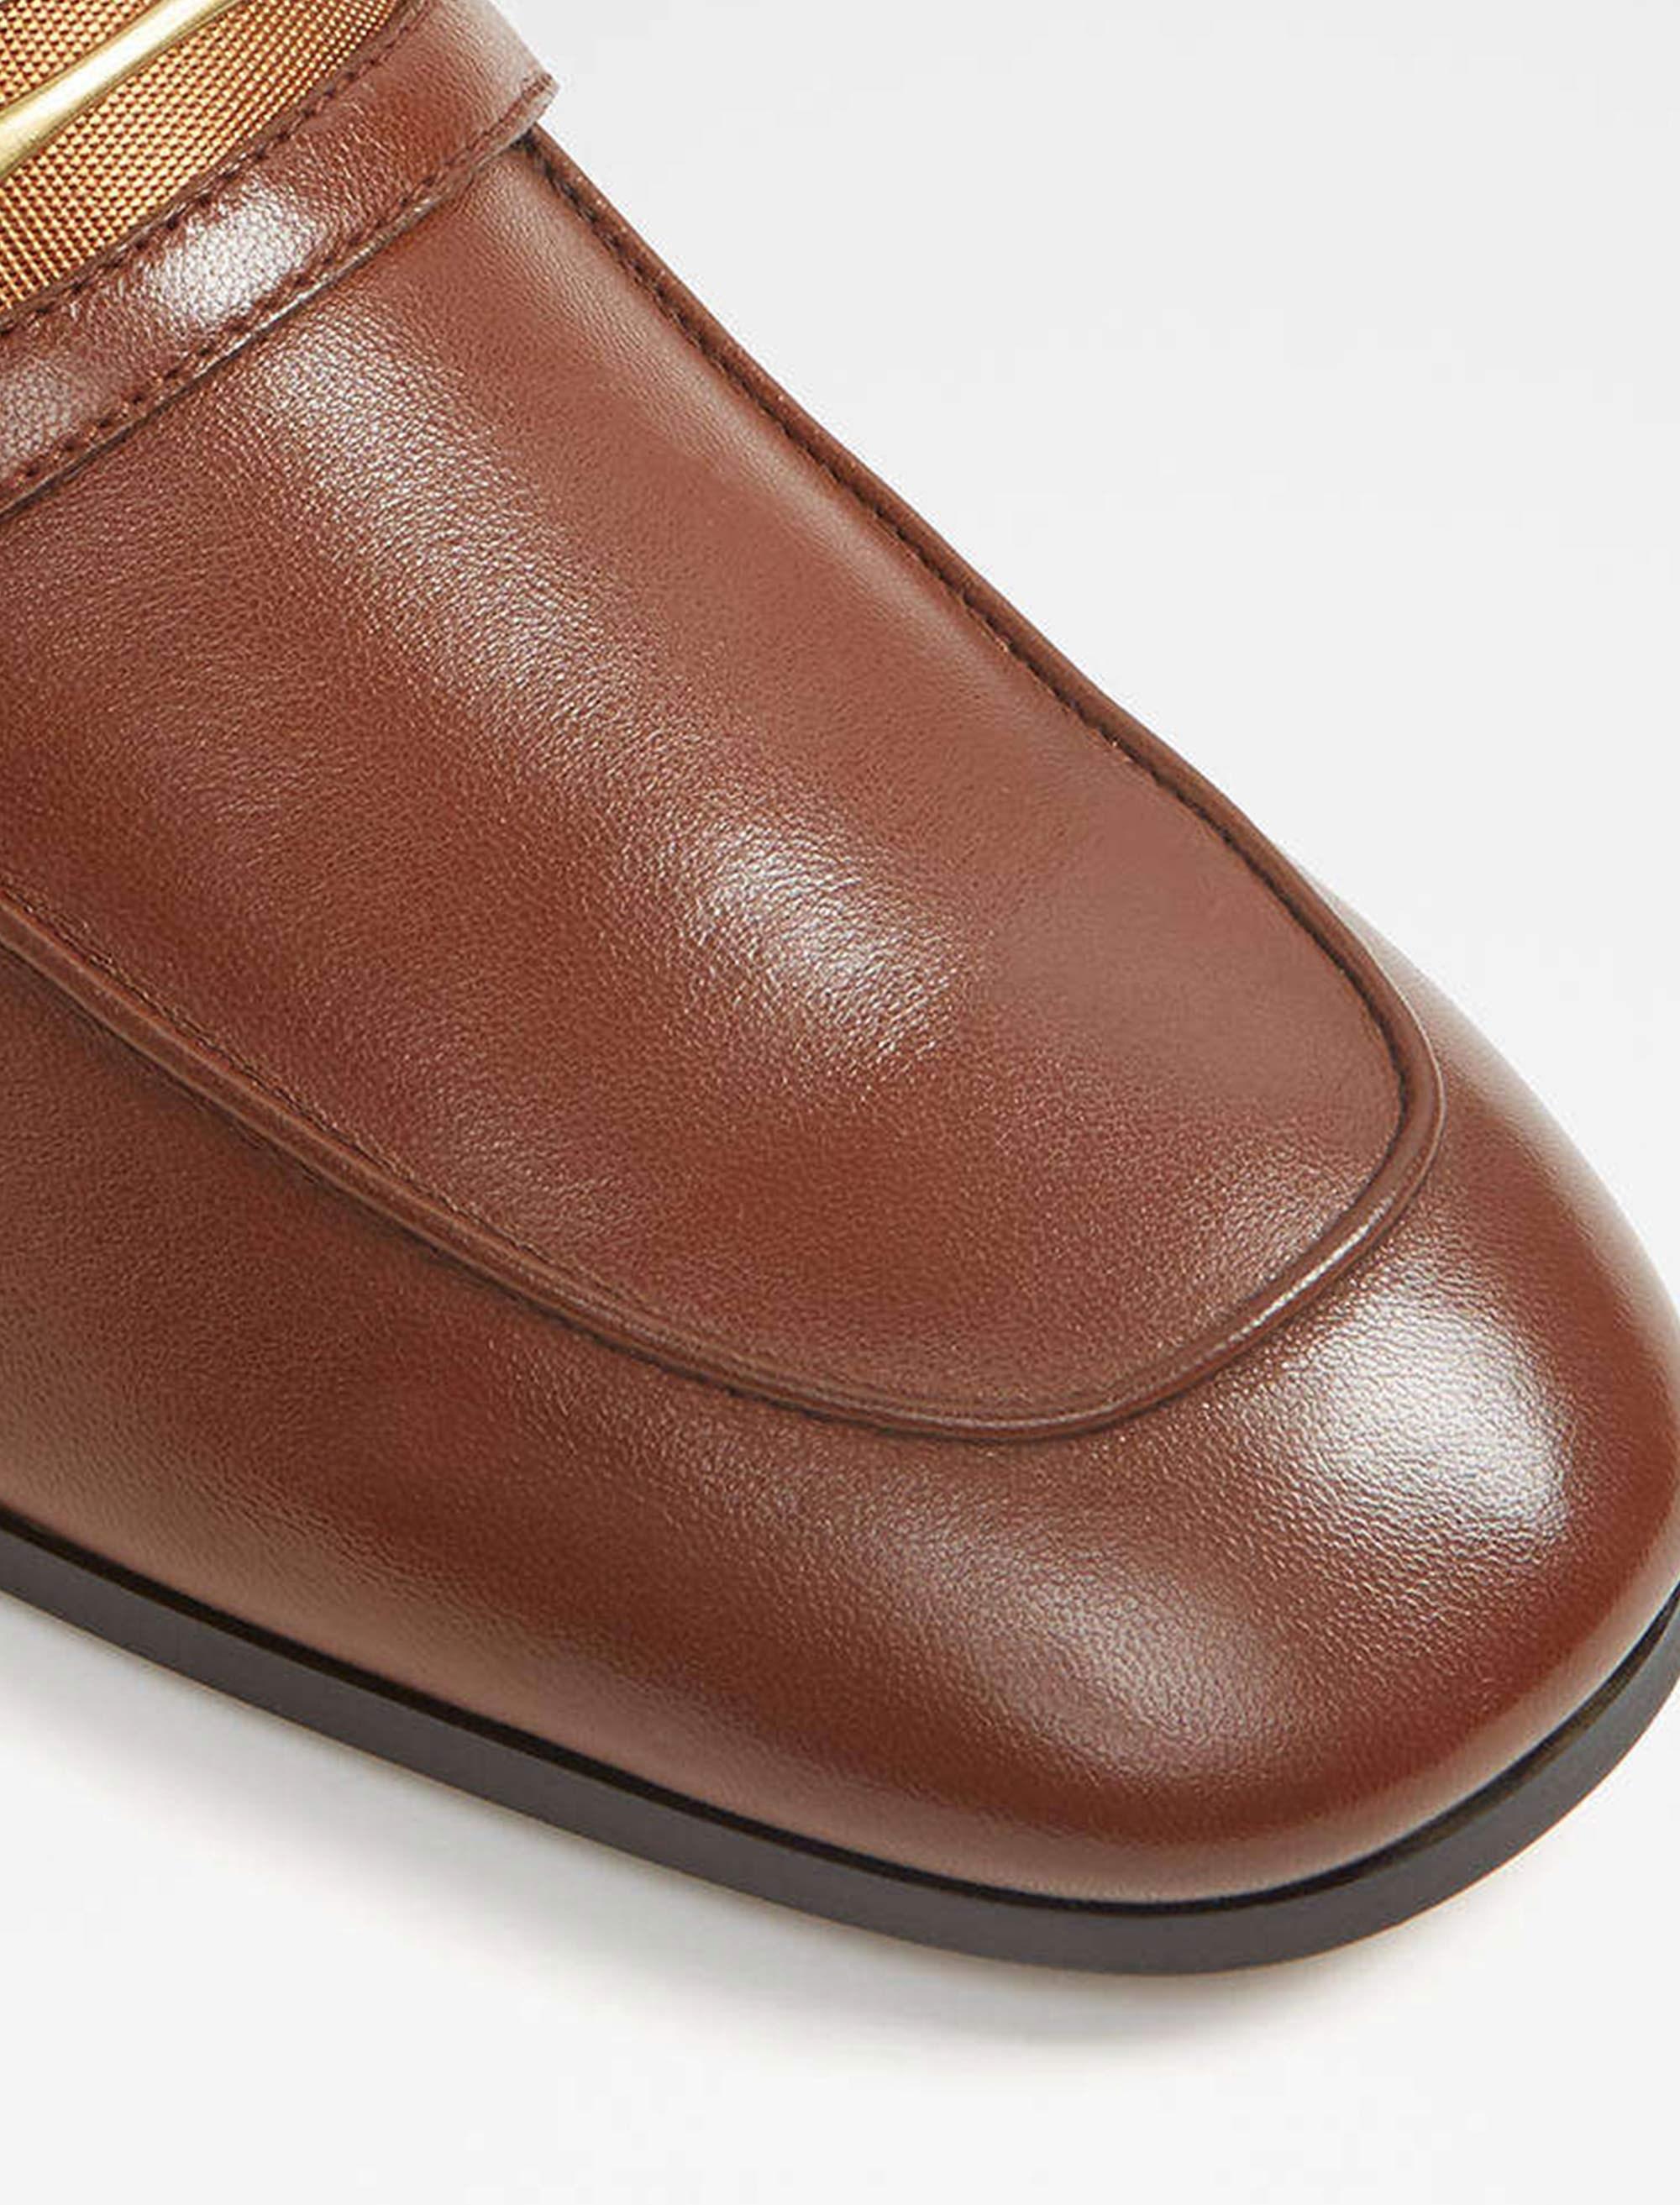 کفش اداری چرم مردانه - قهوه اي - 4